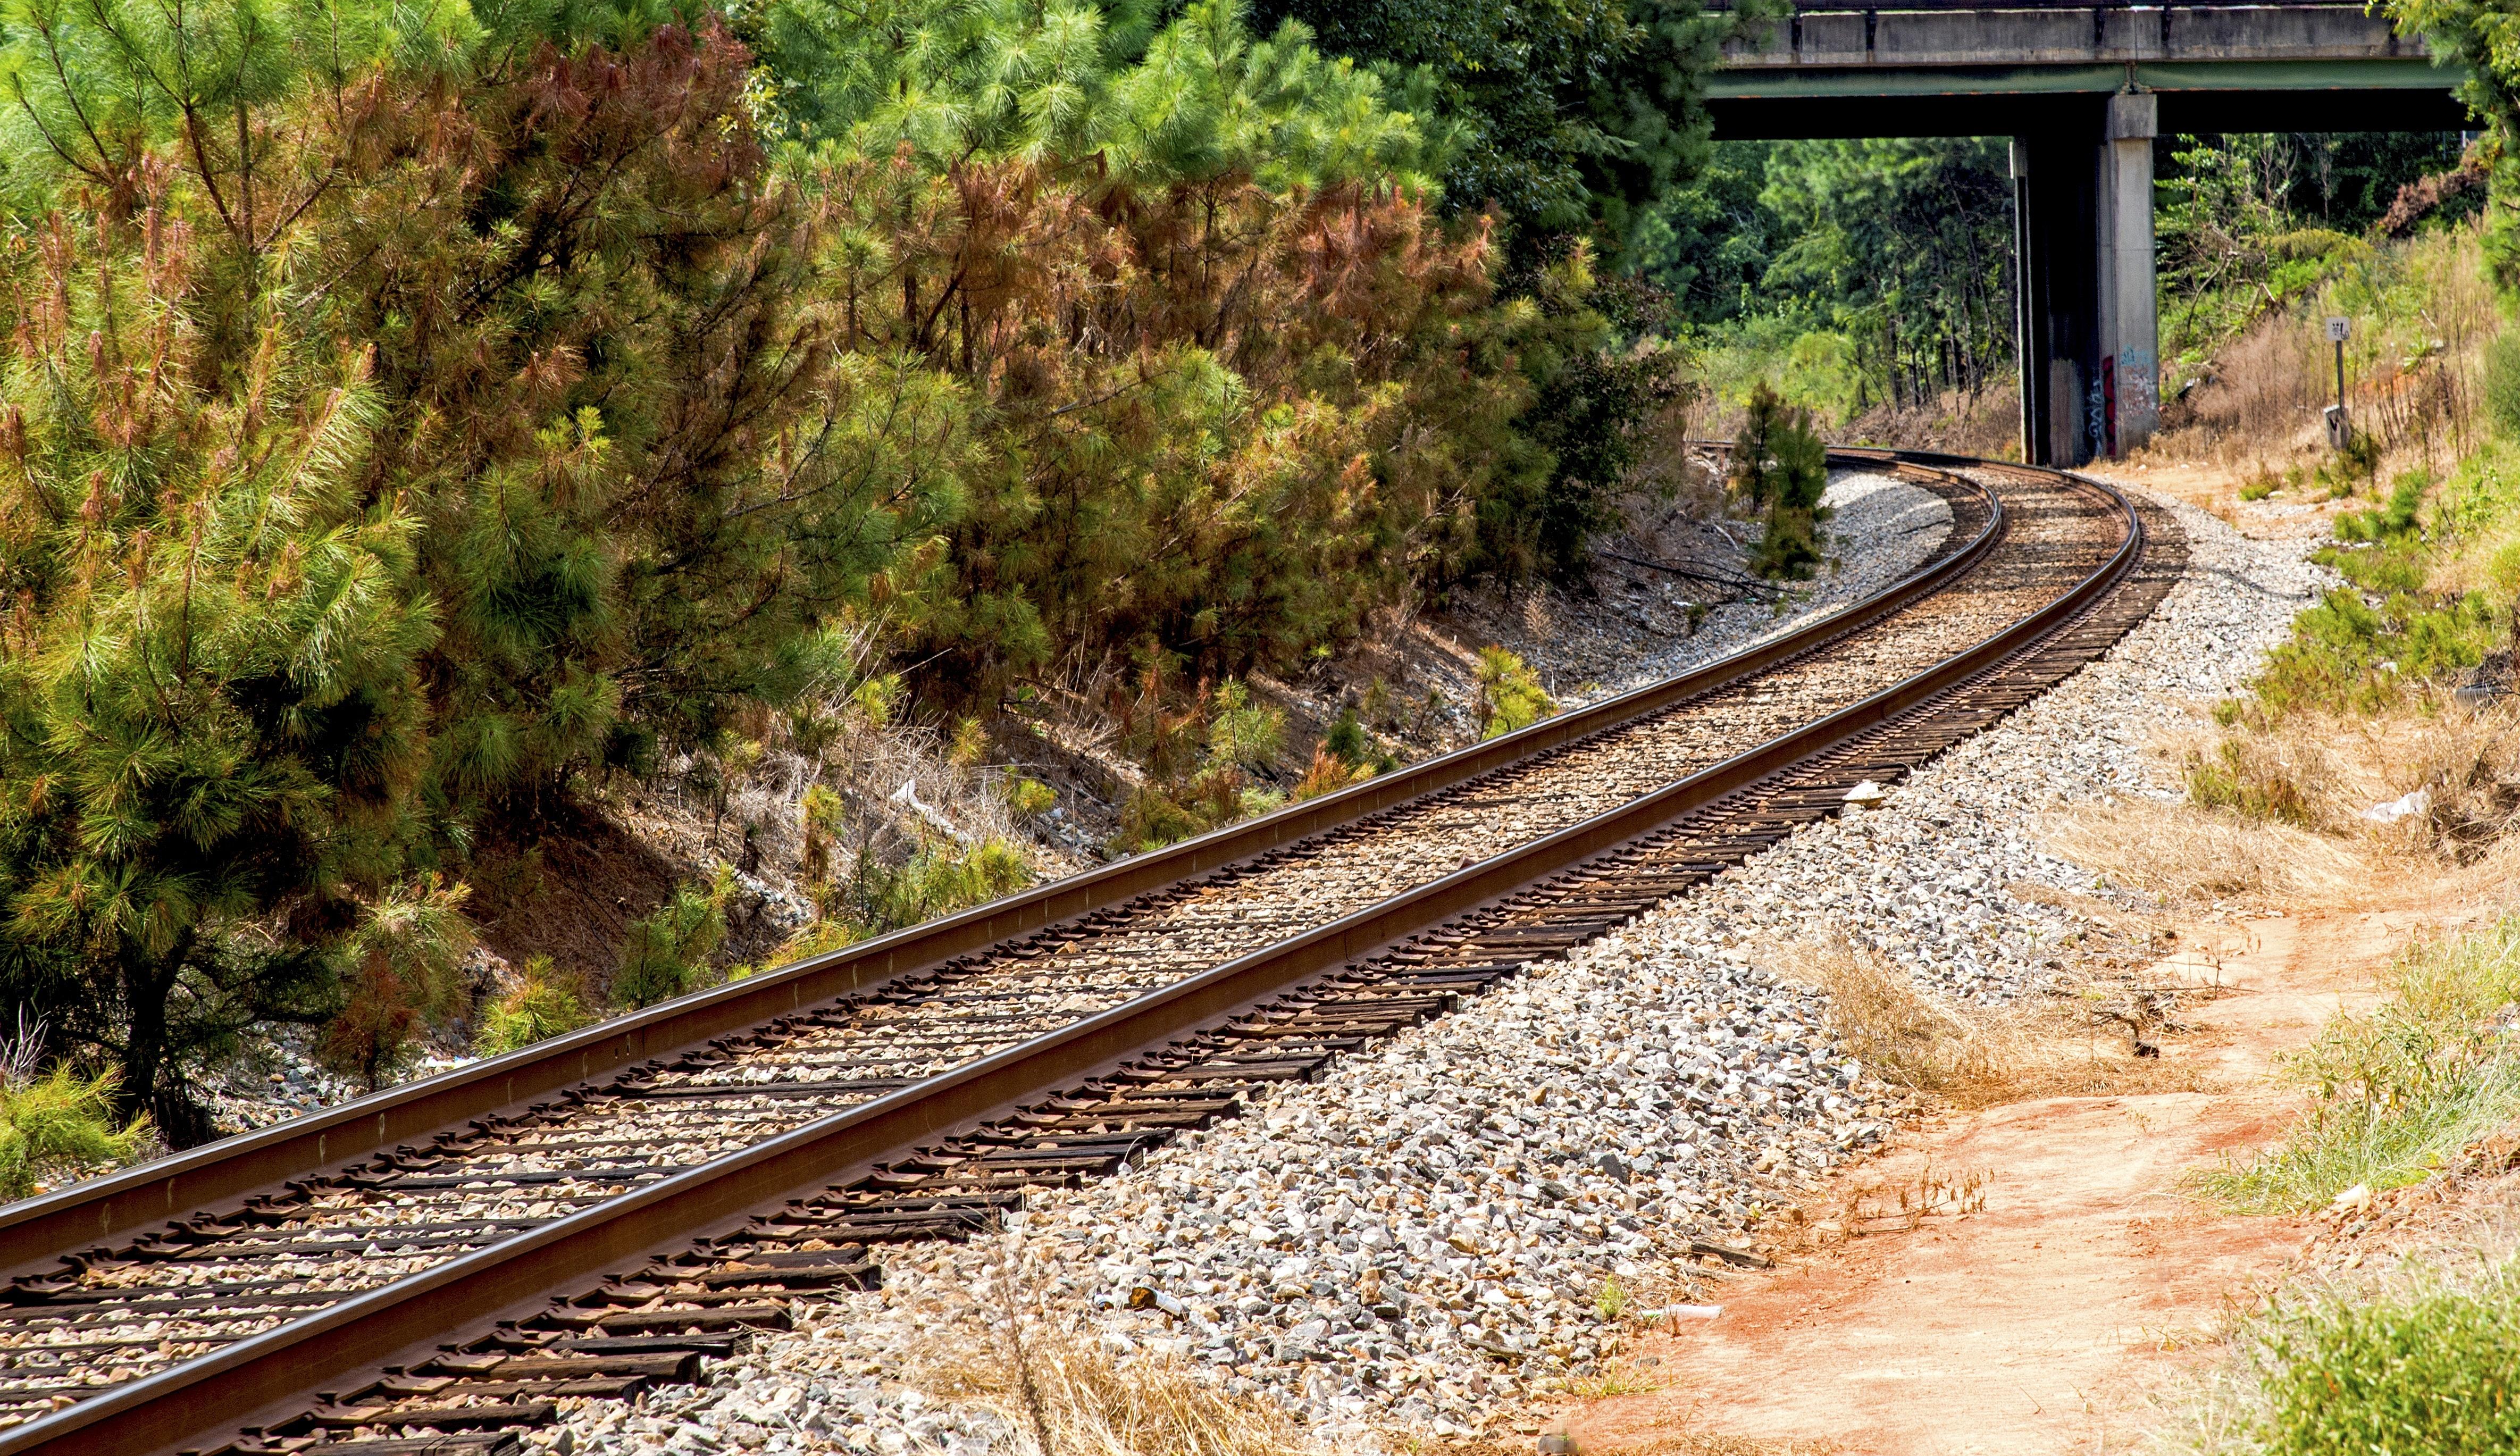 Railroad Tracks Amidst Trees, Railway track, Trees, Travel, Transportation system, HQ Photo